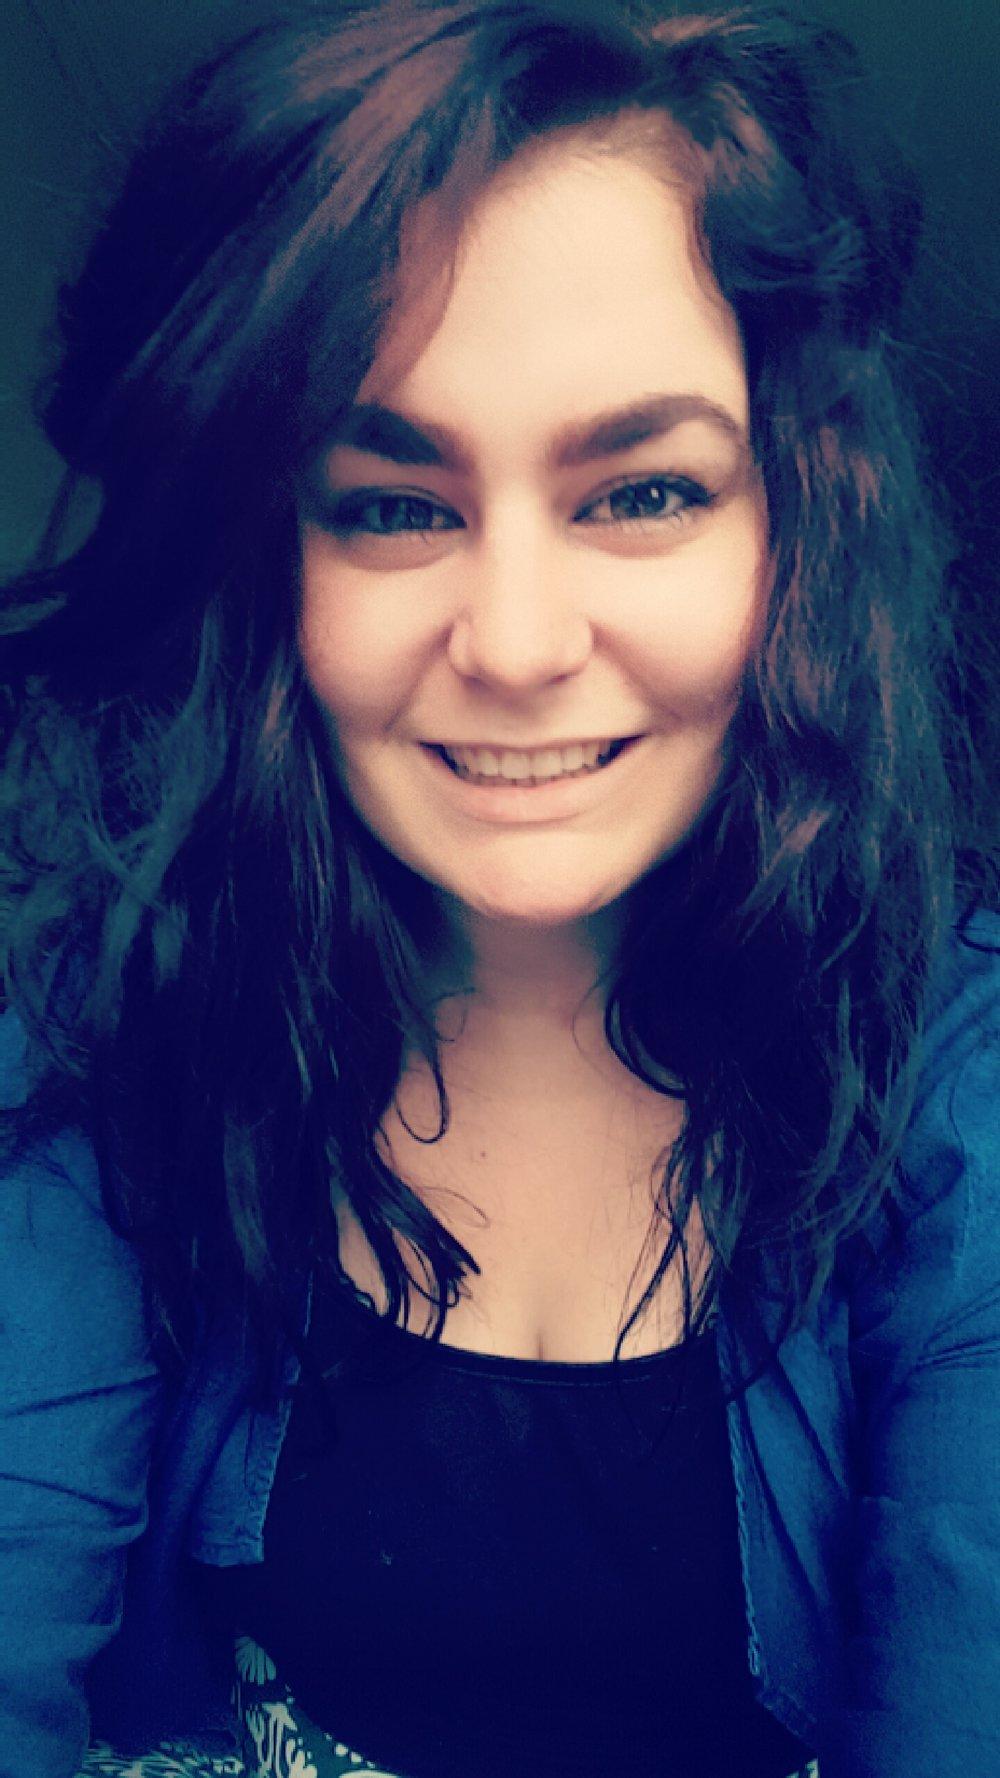 Jiska van der Reest, new PGR blogger